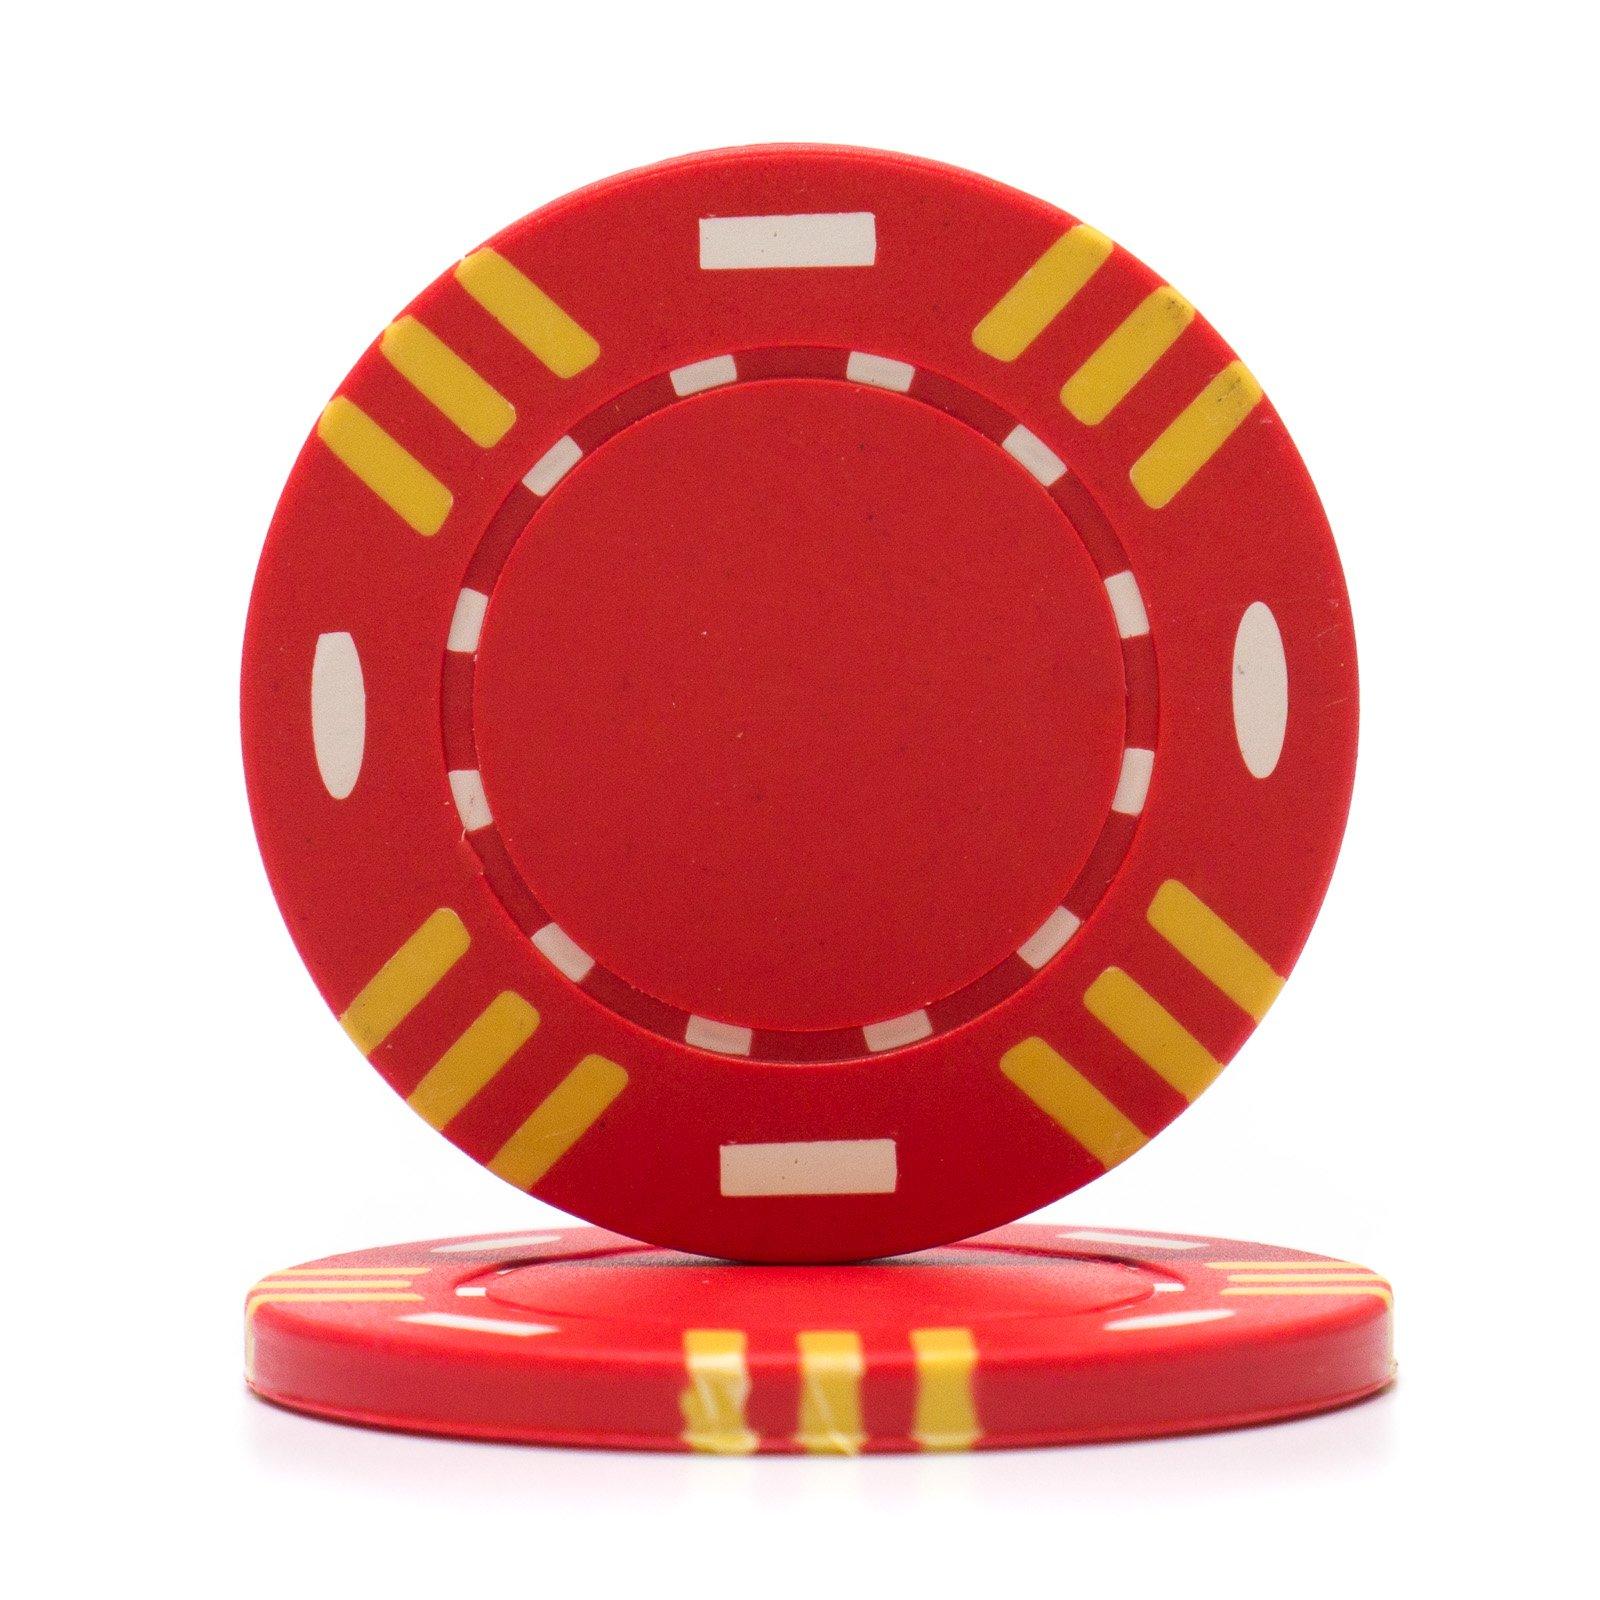 Gambling chips photo